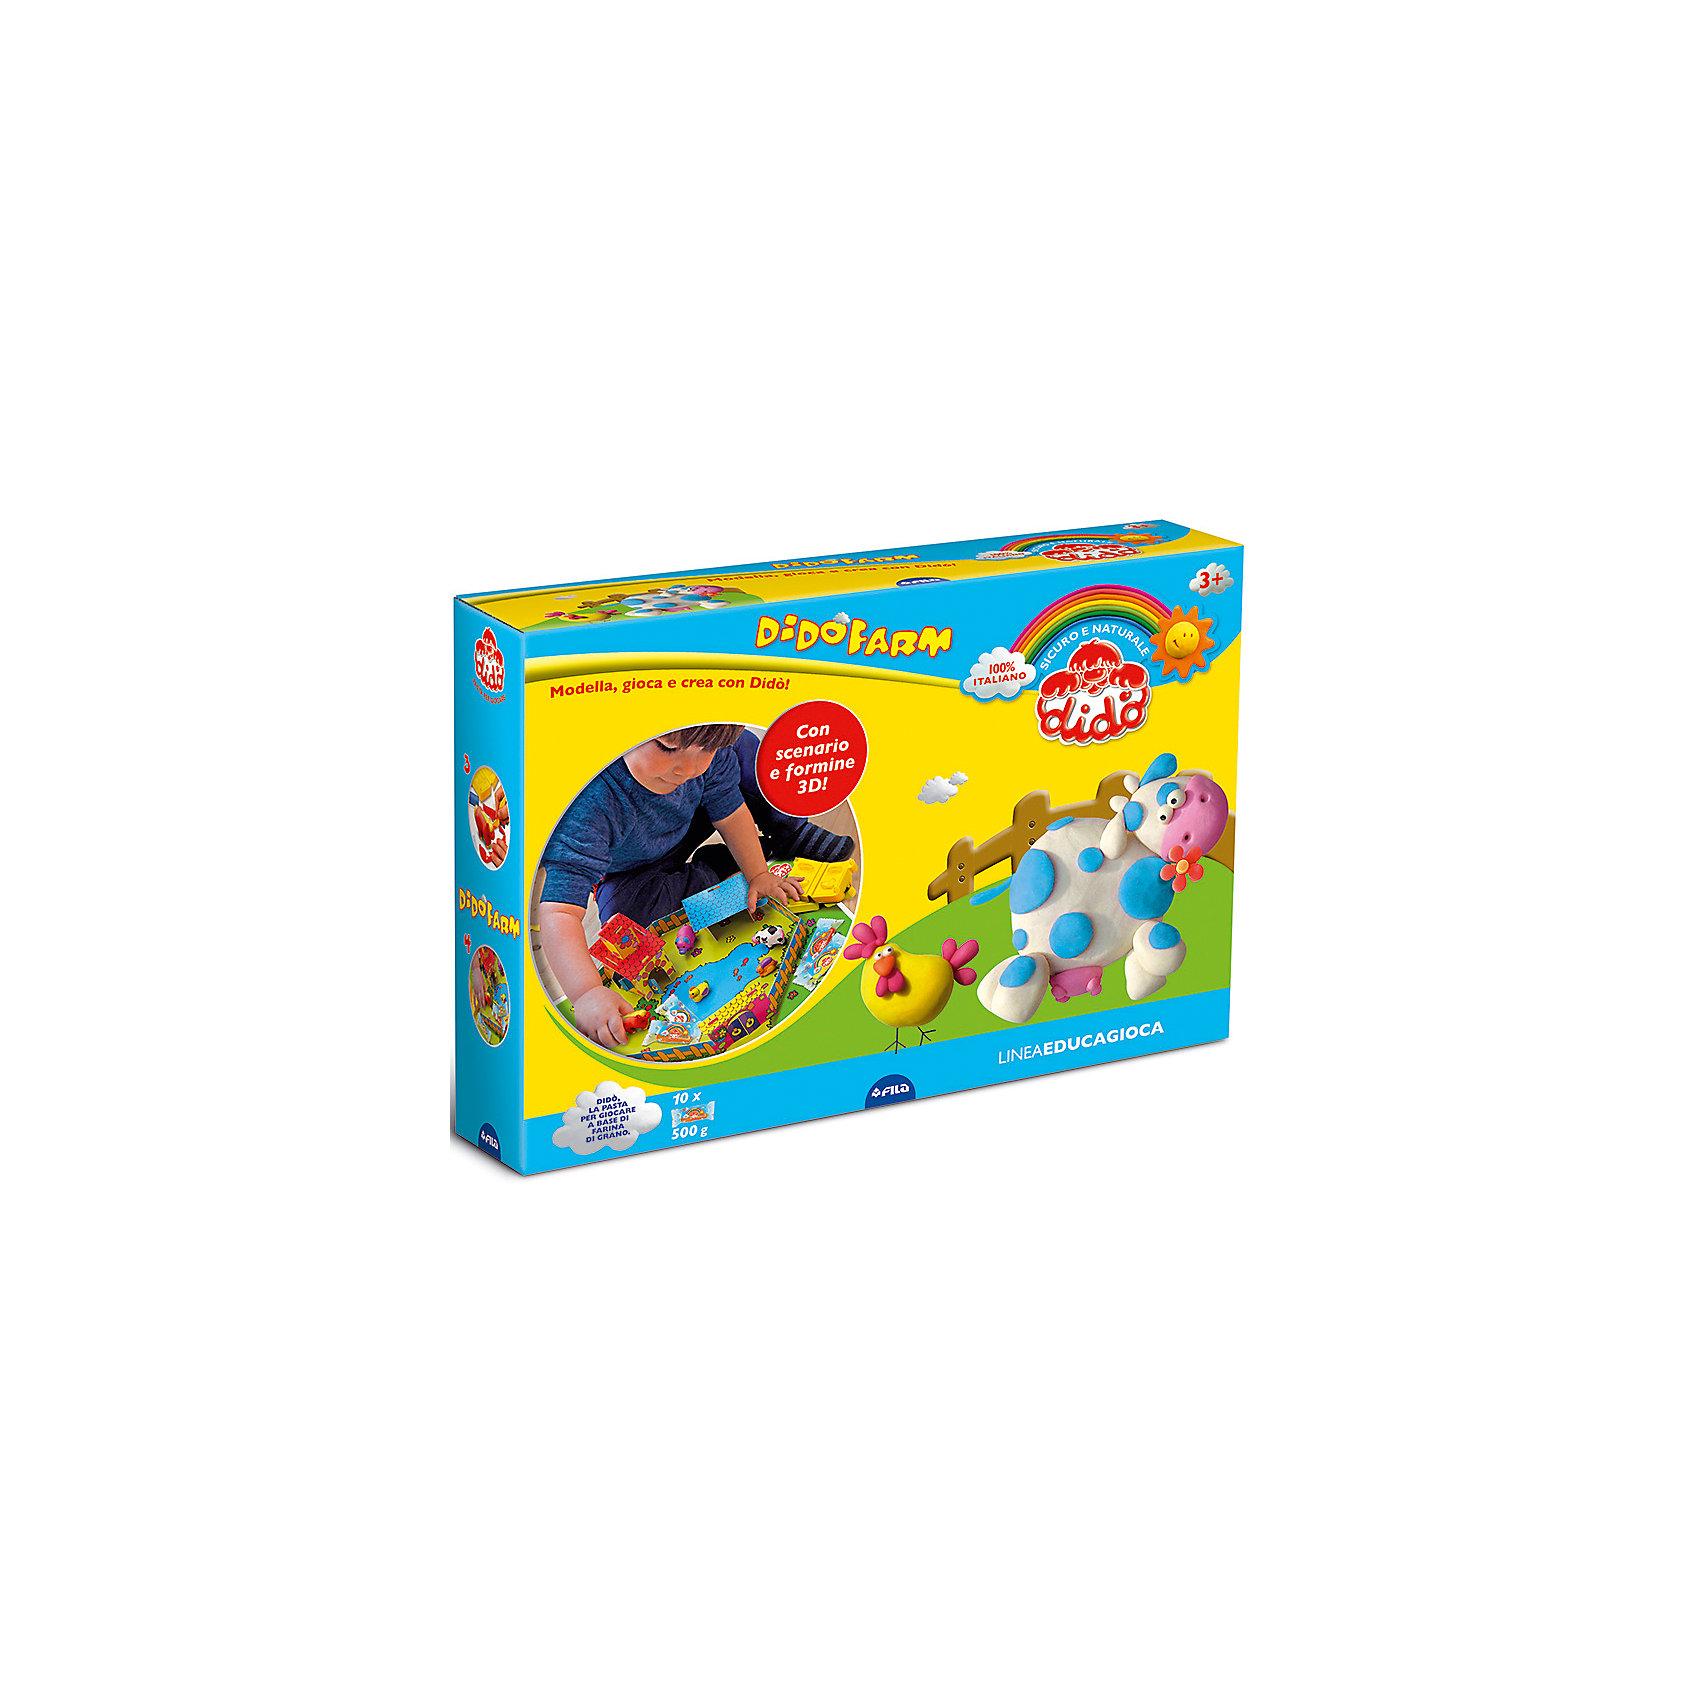 Dido Набор для творчества Веселая ферма barneybuddy barneybuddy игрушки для ванны стикеры веселая ферма